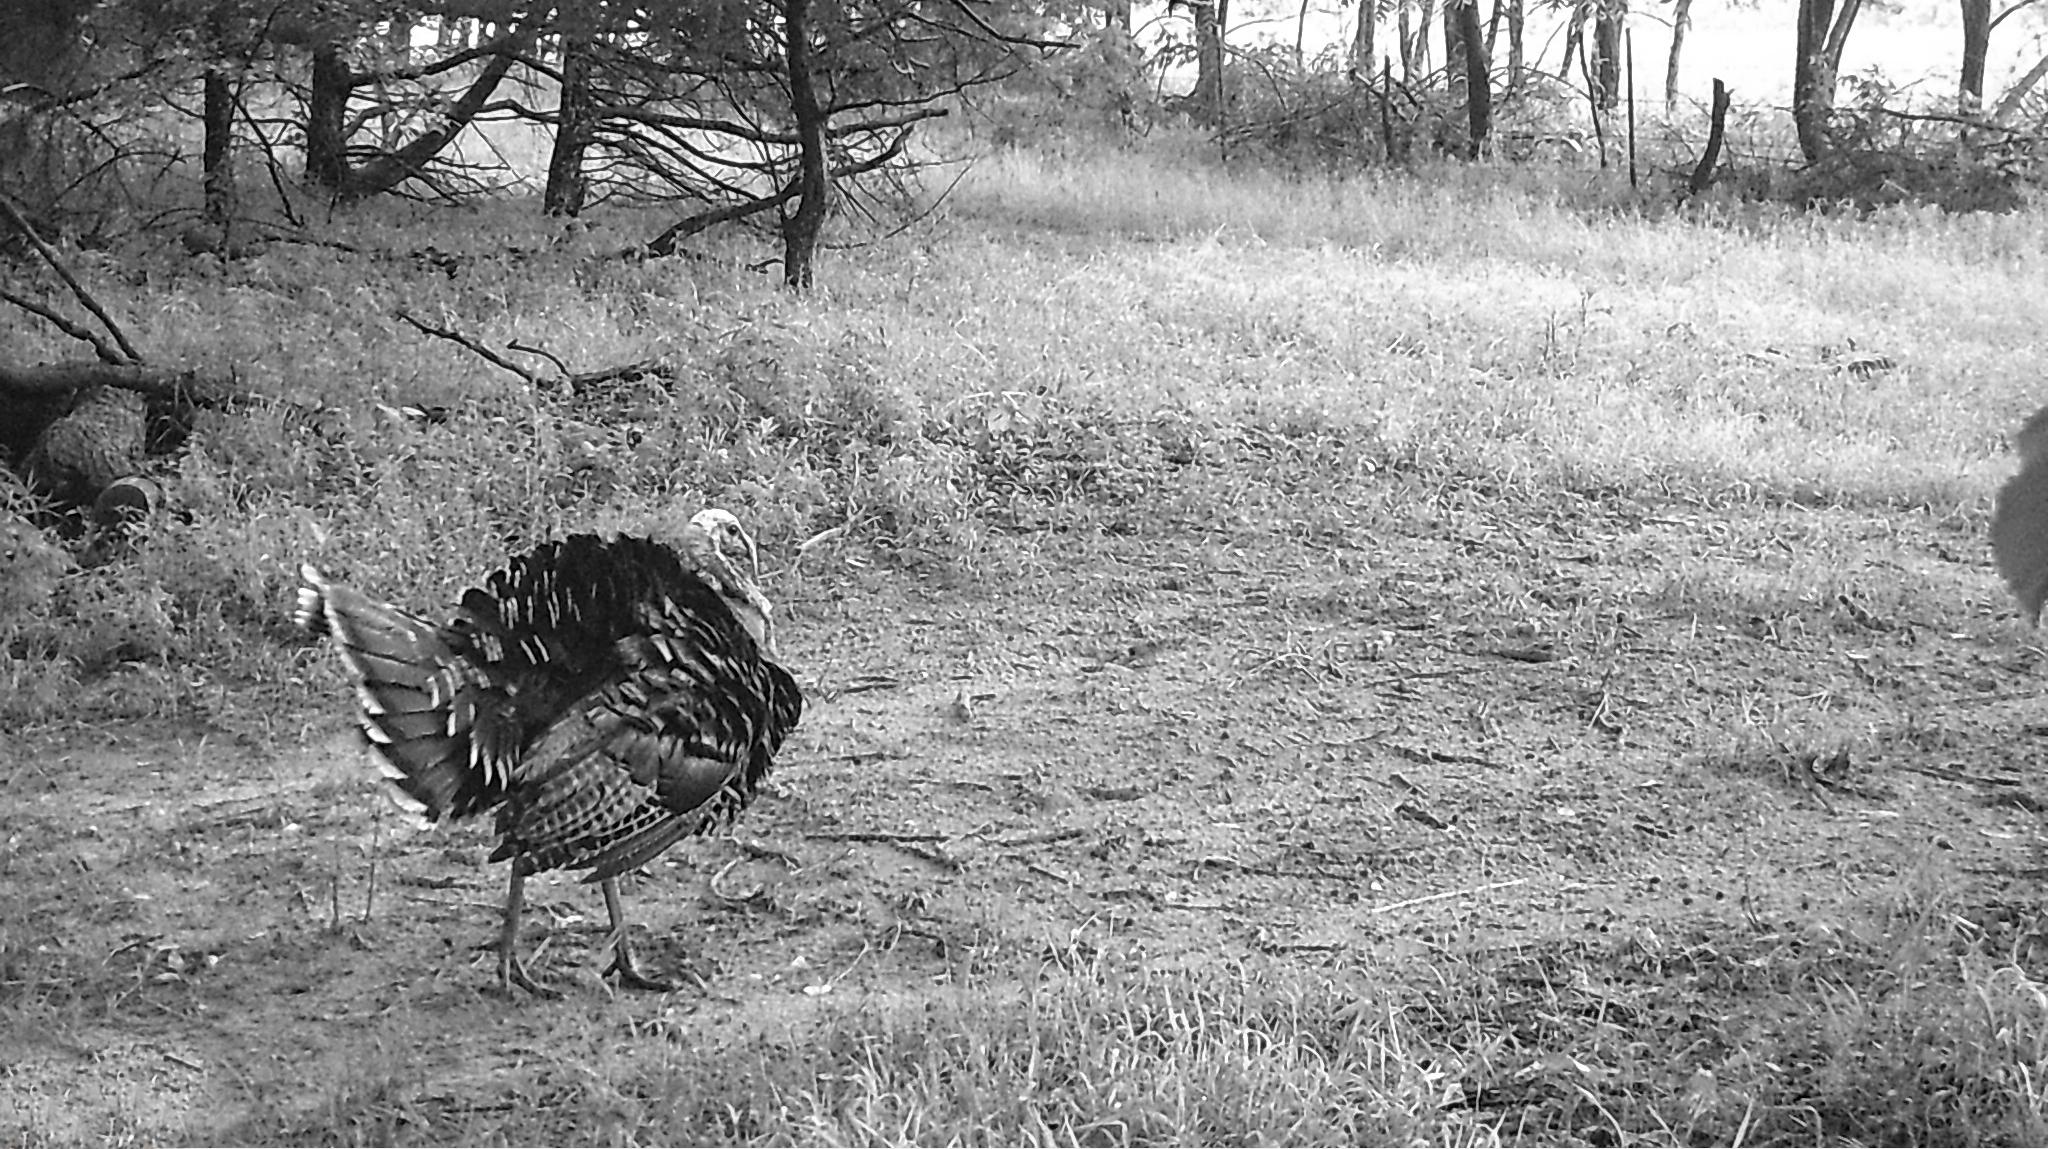 Tom-turkey.jpg